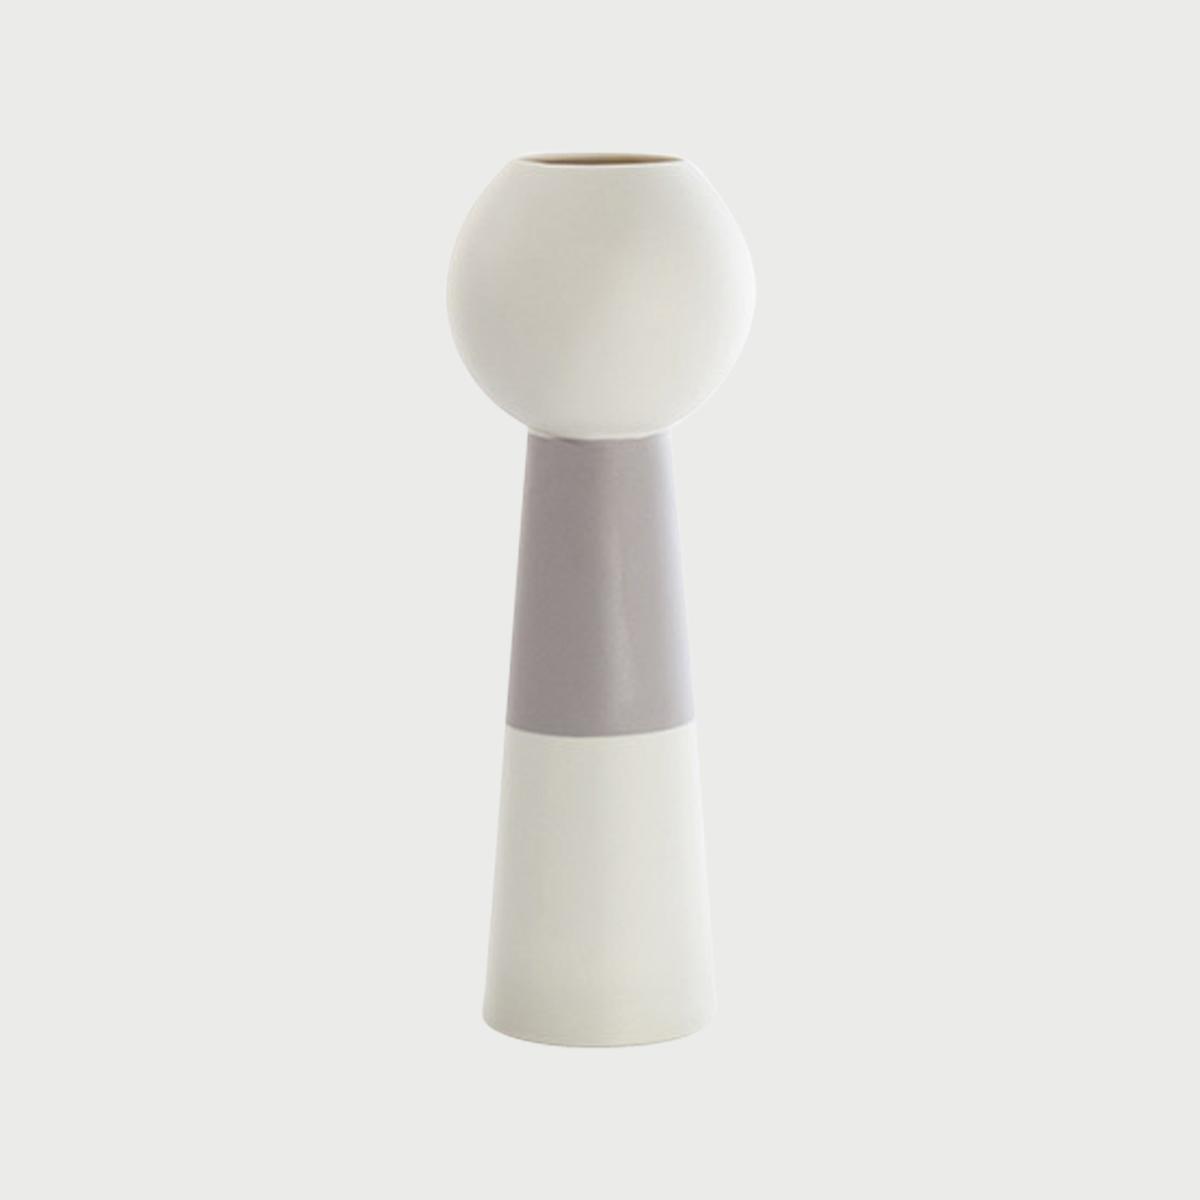 Versa vase down white grey